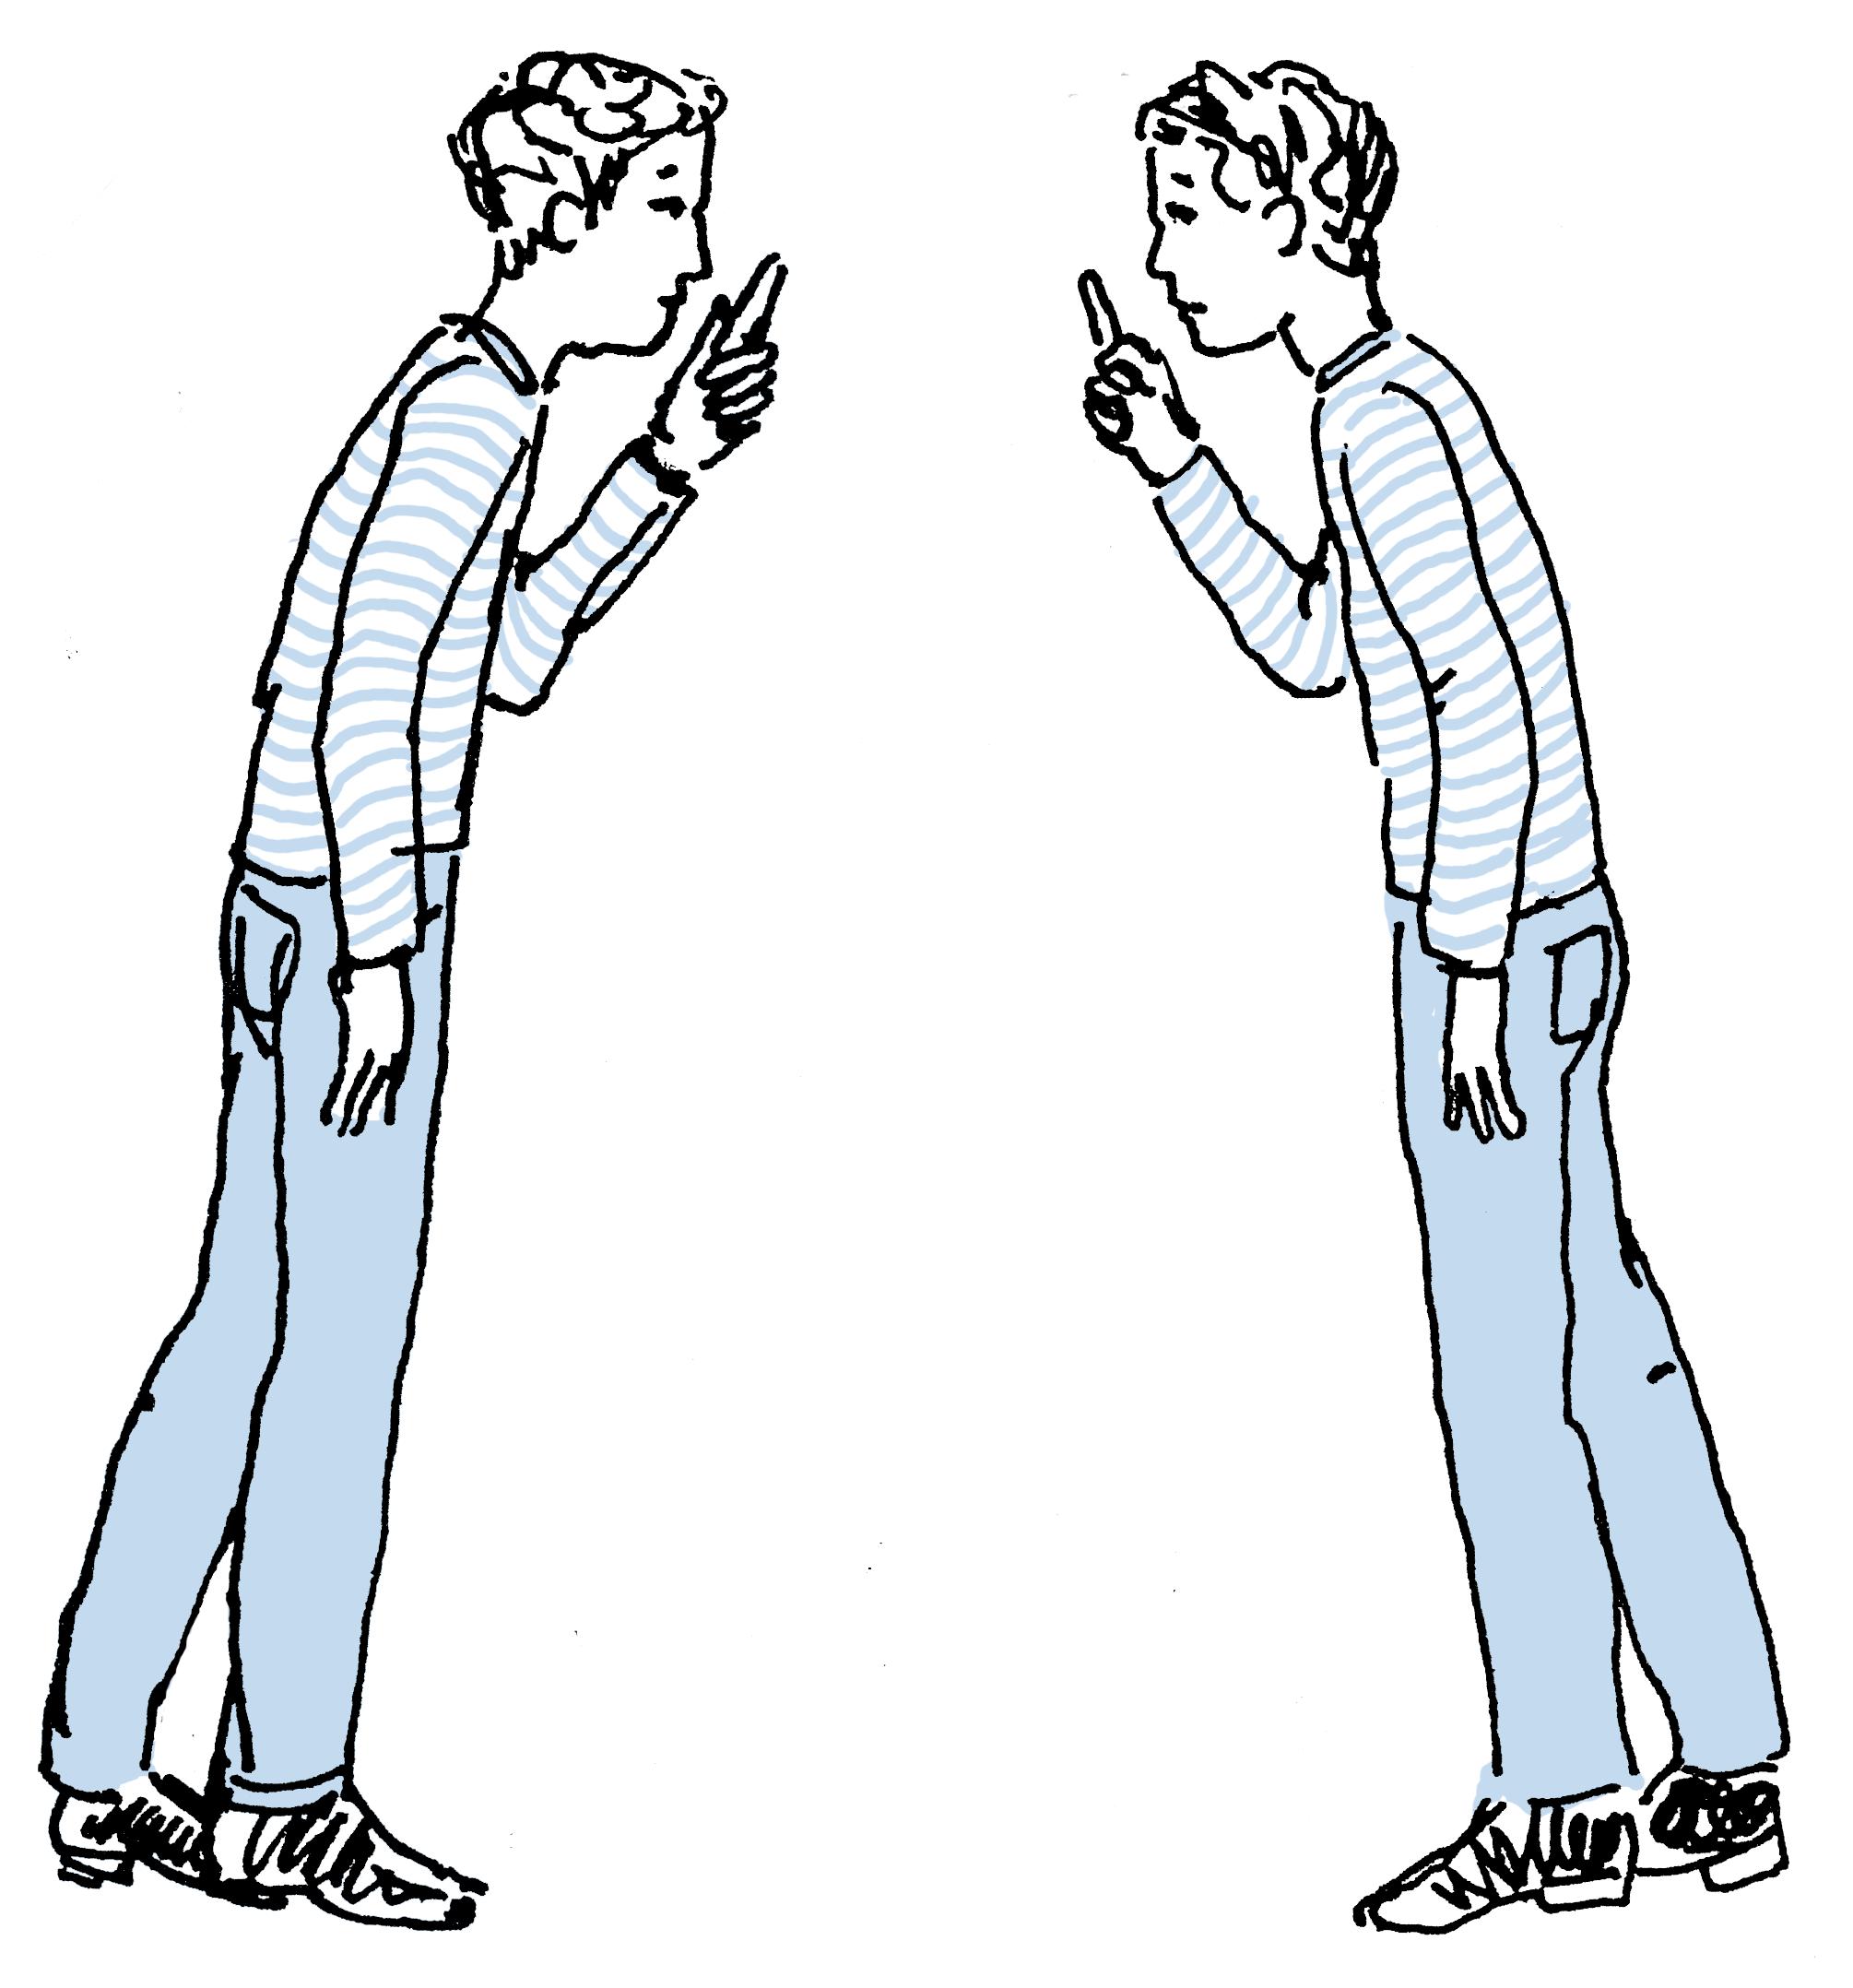 Illustratie twee gespiegelde mannetjes in gesprek